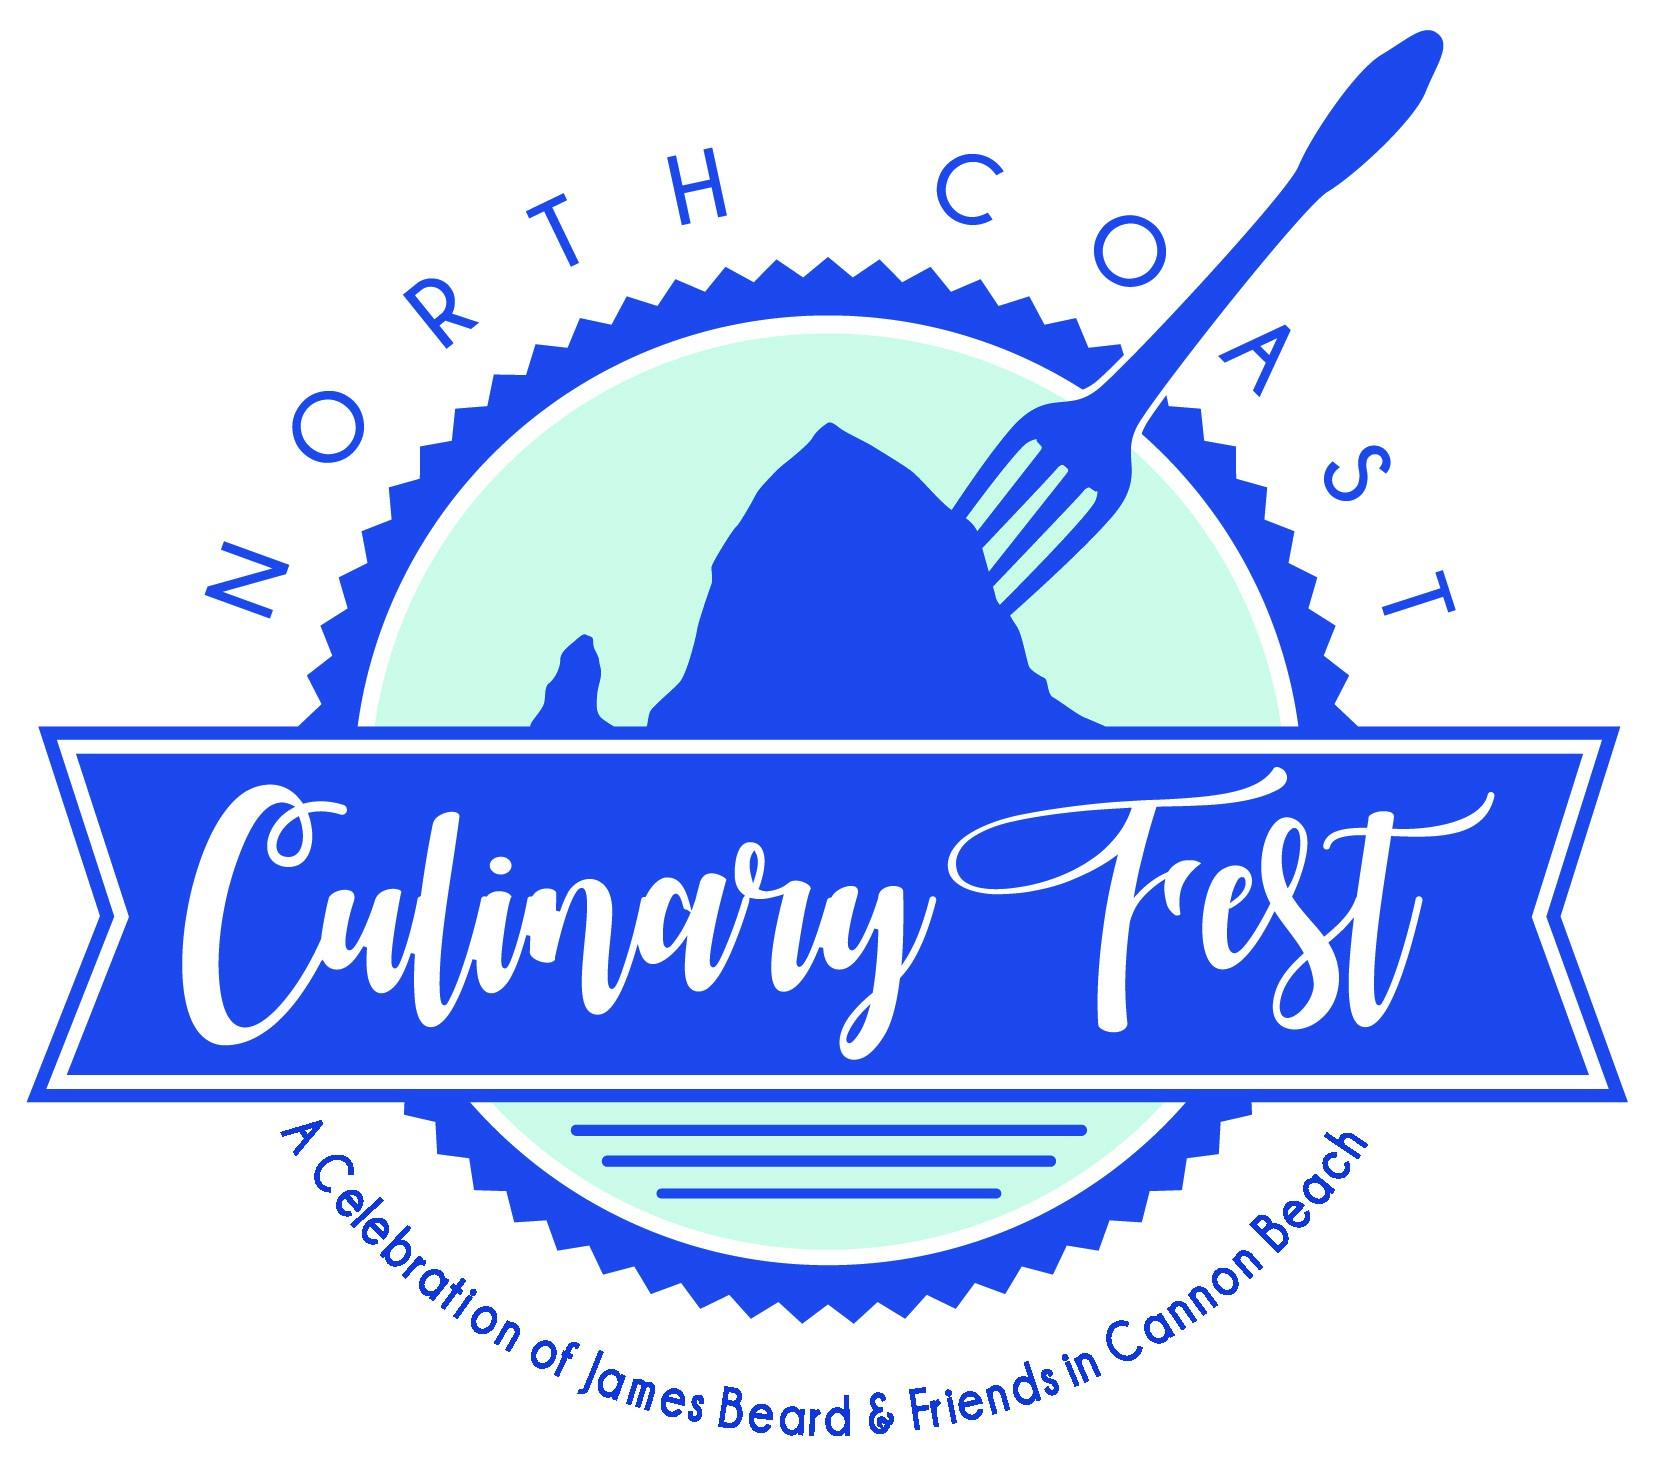 Culinary Fest